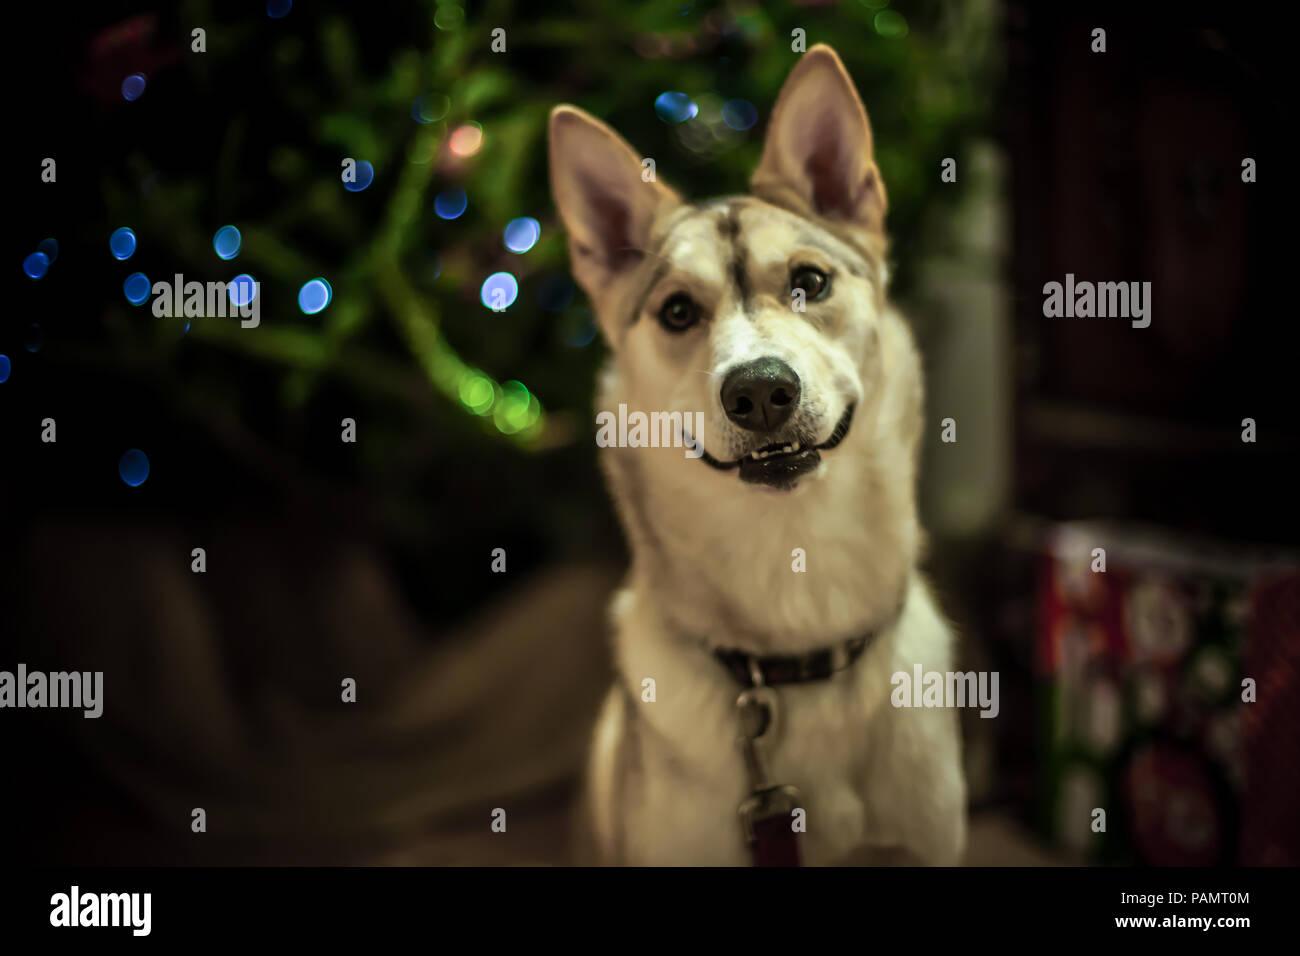 Smiling alaskan husky dog in front of christmas tree - Stock Image